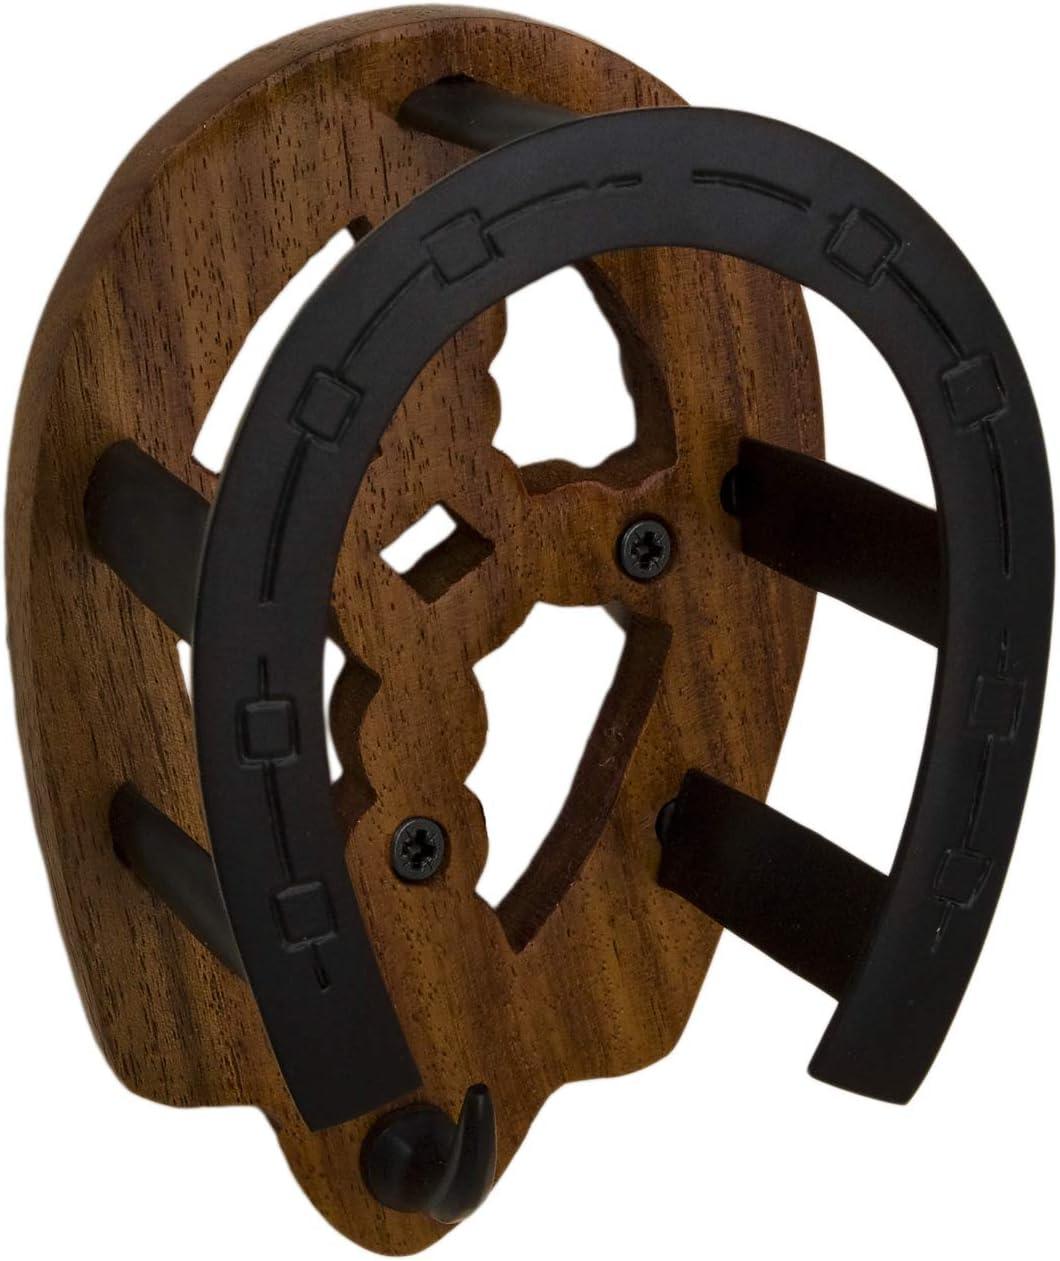 Tack Room Studio Brass Horseshoe Bridle Rack (Black & Wood) : Pet Supplies